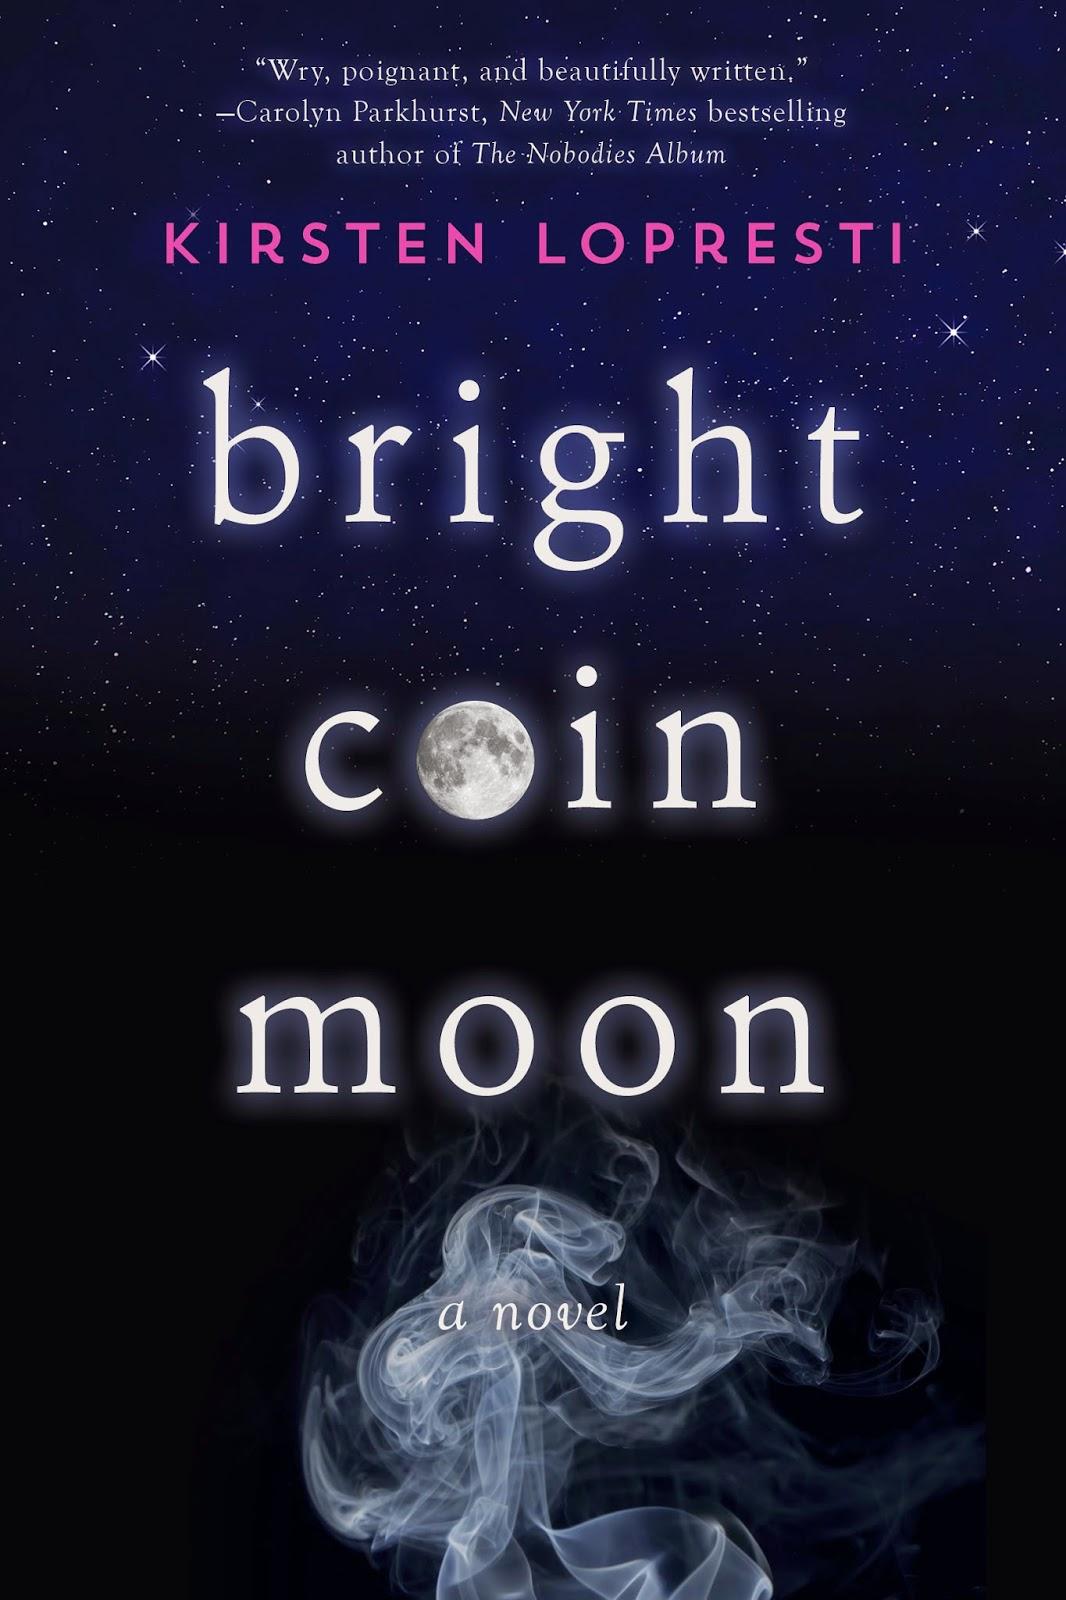 New Voices: Kirsten Lopresti on Bright Coin Moon